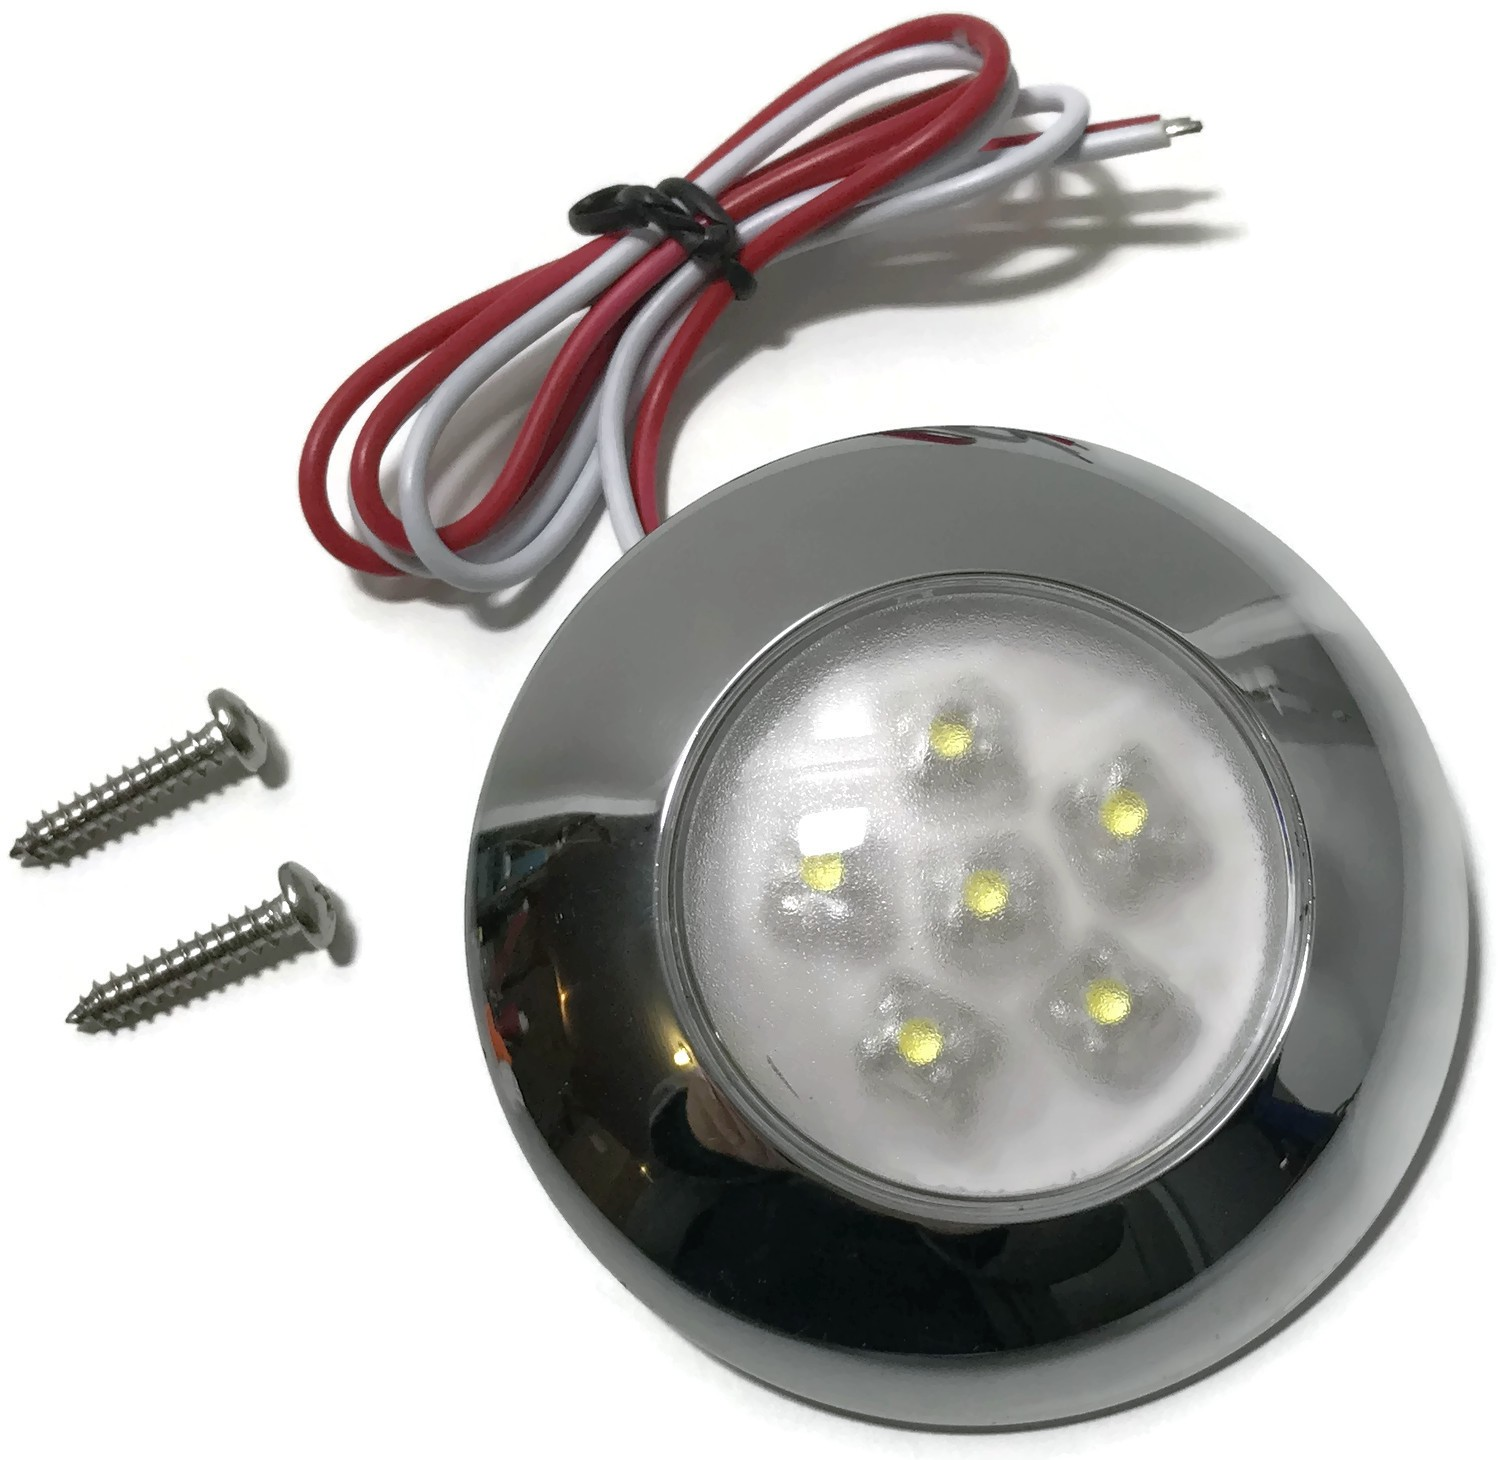 OCZKO LED LAMPKA LAMPA DOM PODBITKA B. CIEPŁY 12V